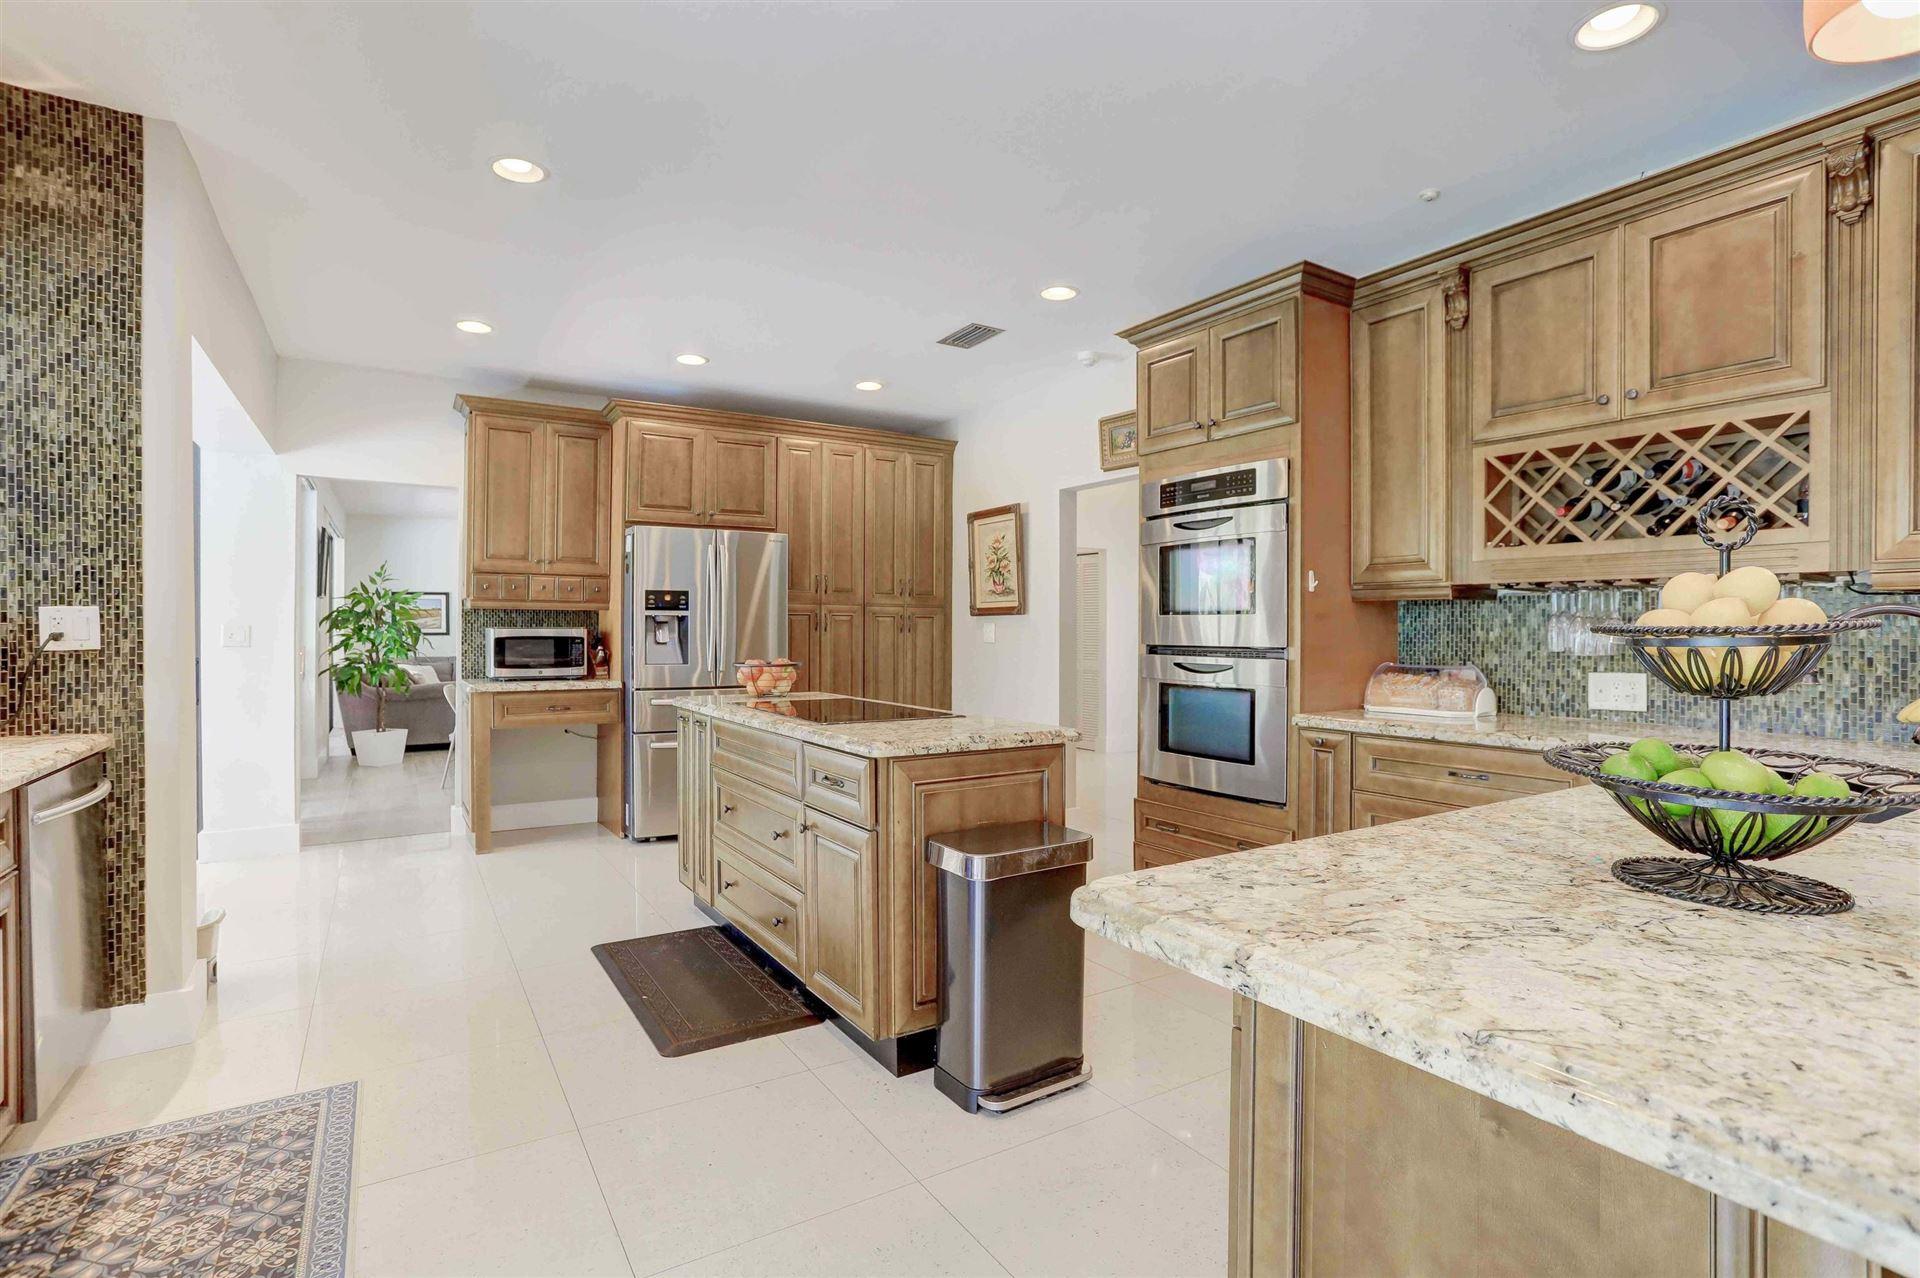 11415 Sundance Lane, Boca Raton, FL 33428 - MLS#: RX-10715332